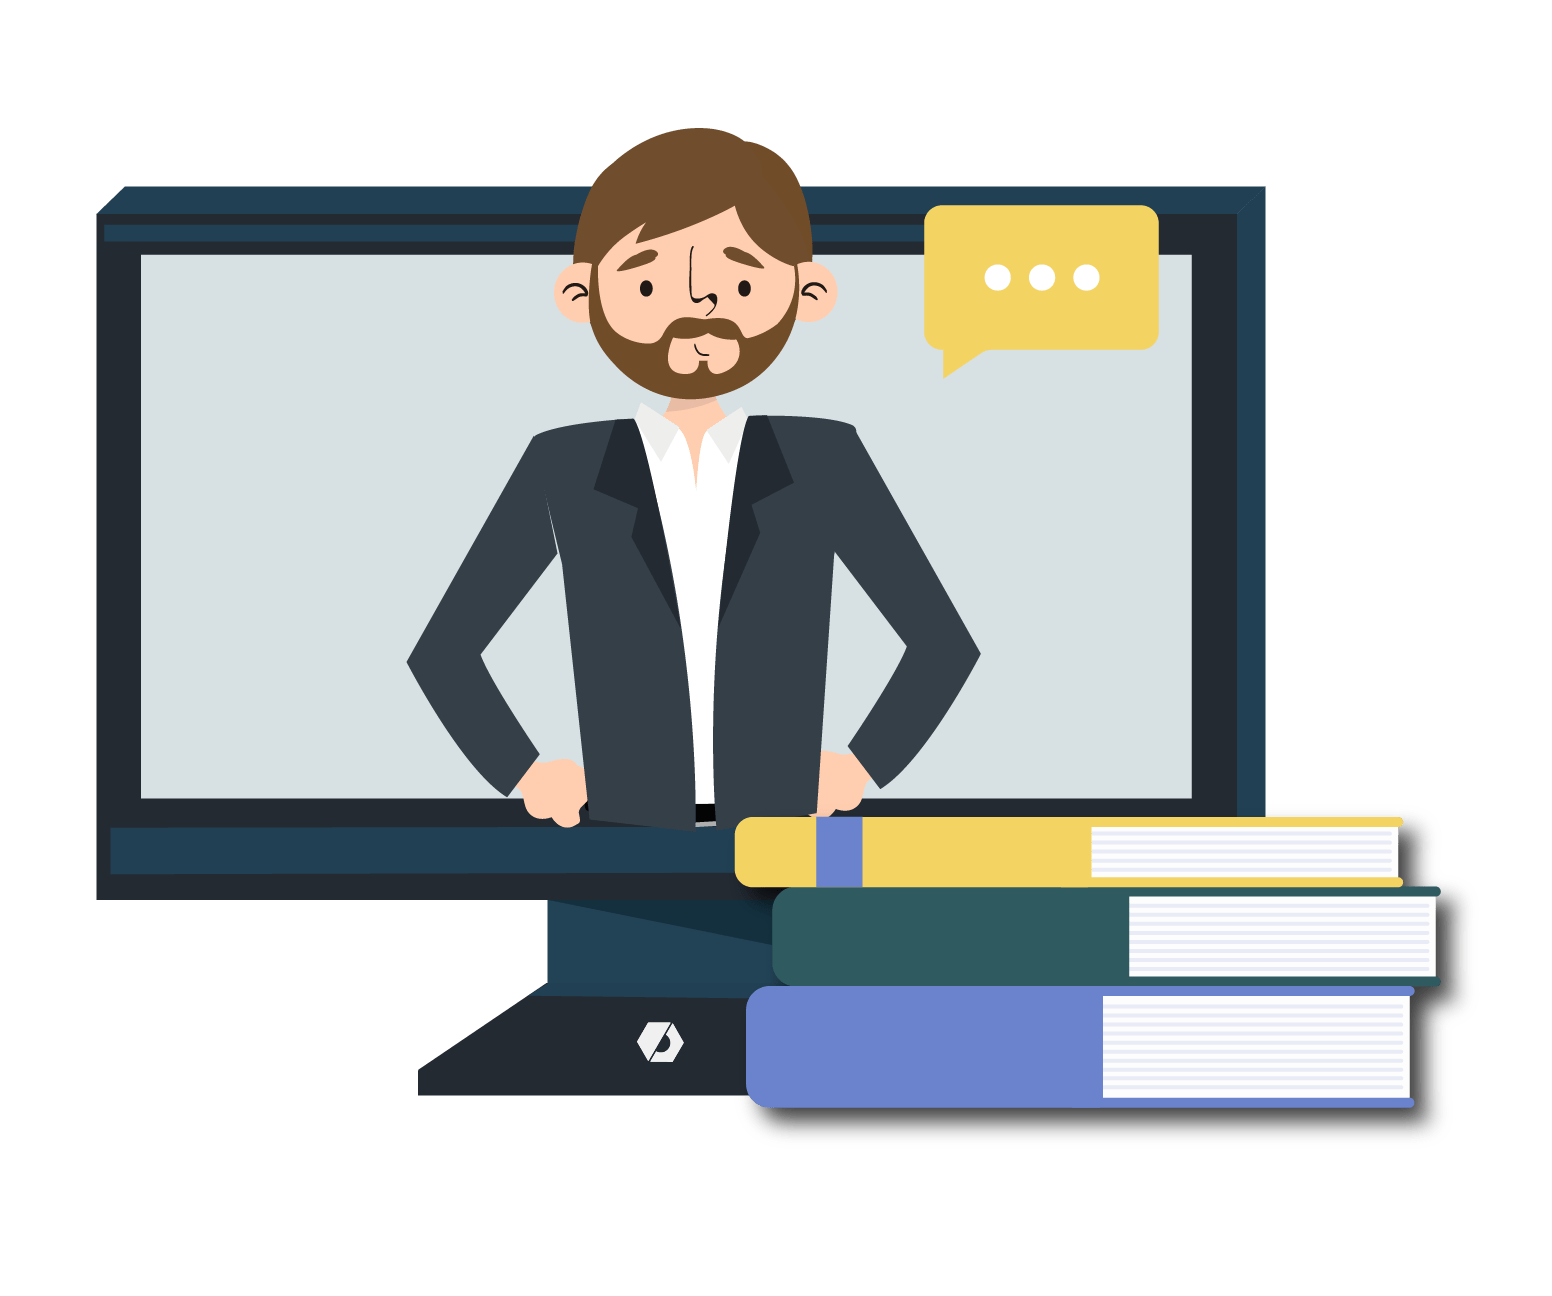 curso gratuito en SAP con logali